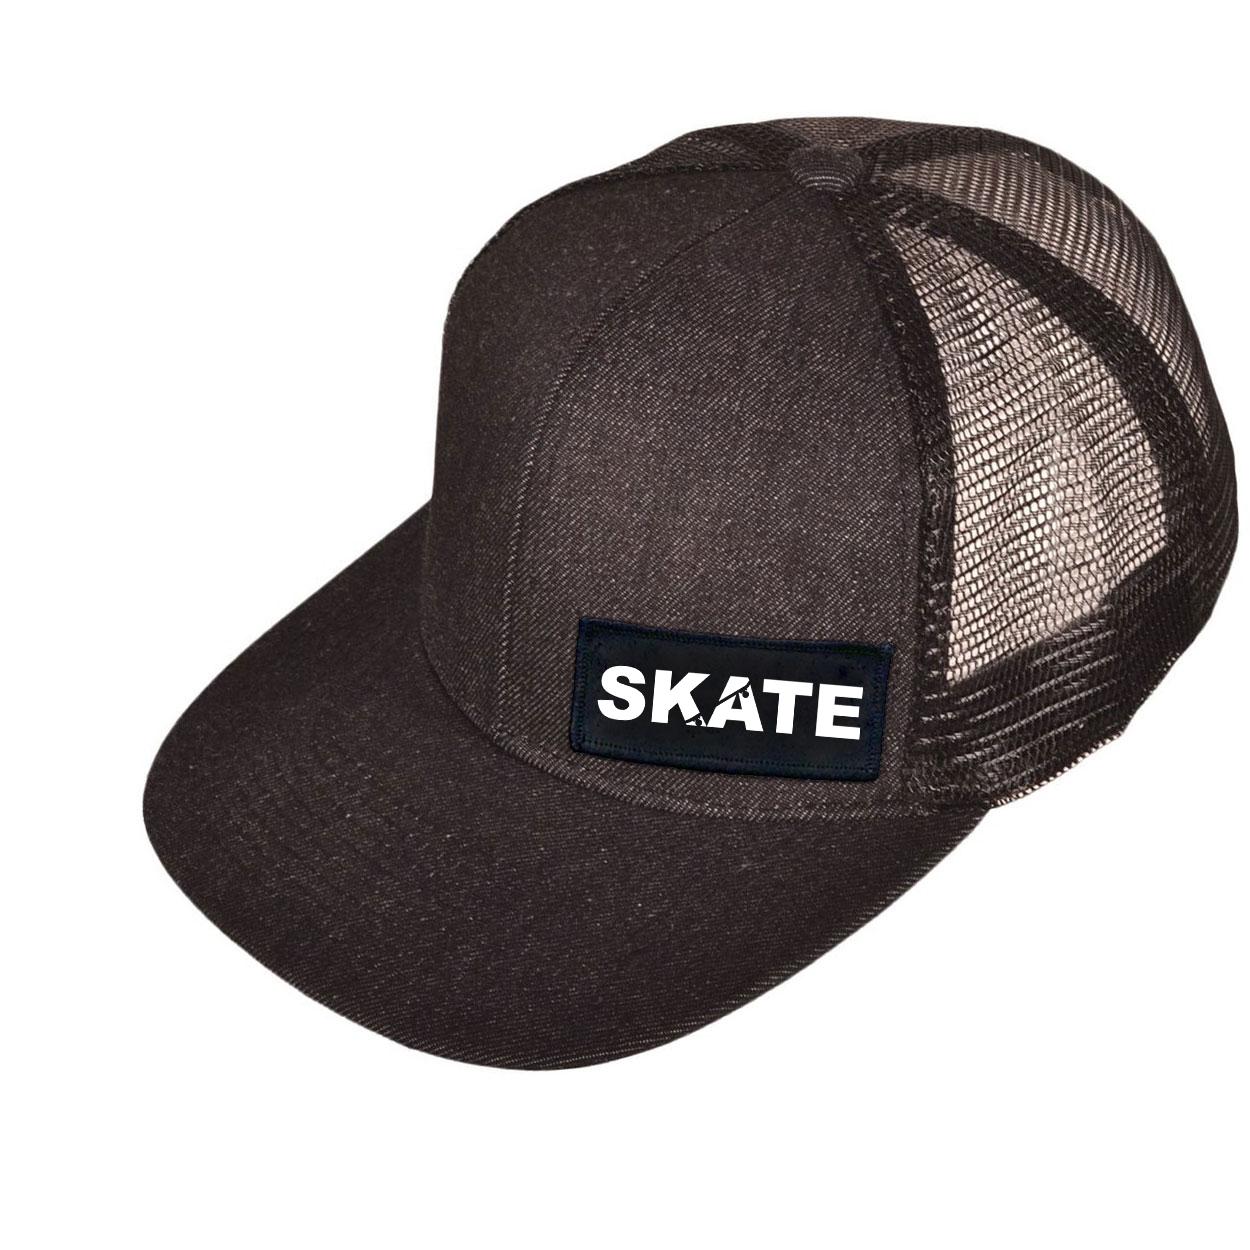 Skate Ollie Skateboard Logo Night Out Woven Patch Snapback Flat Brim Hat Black Denim (White Logo)